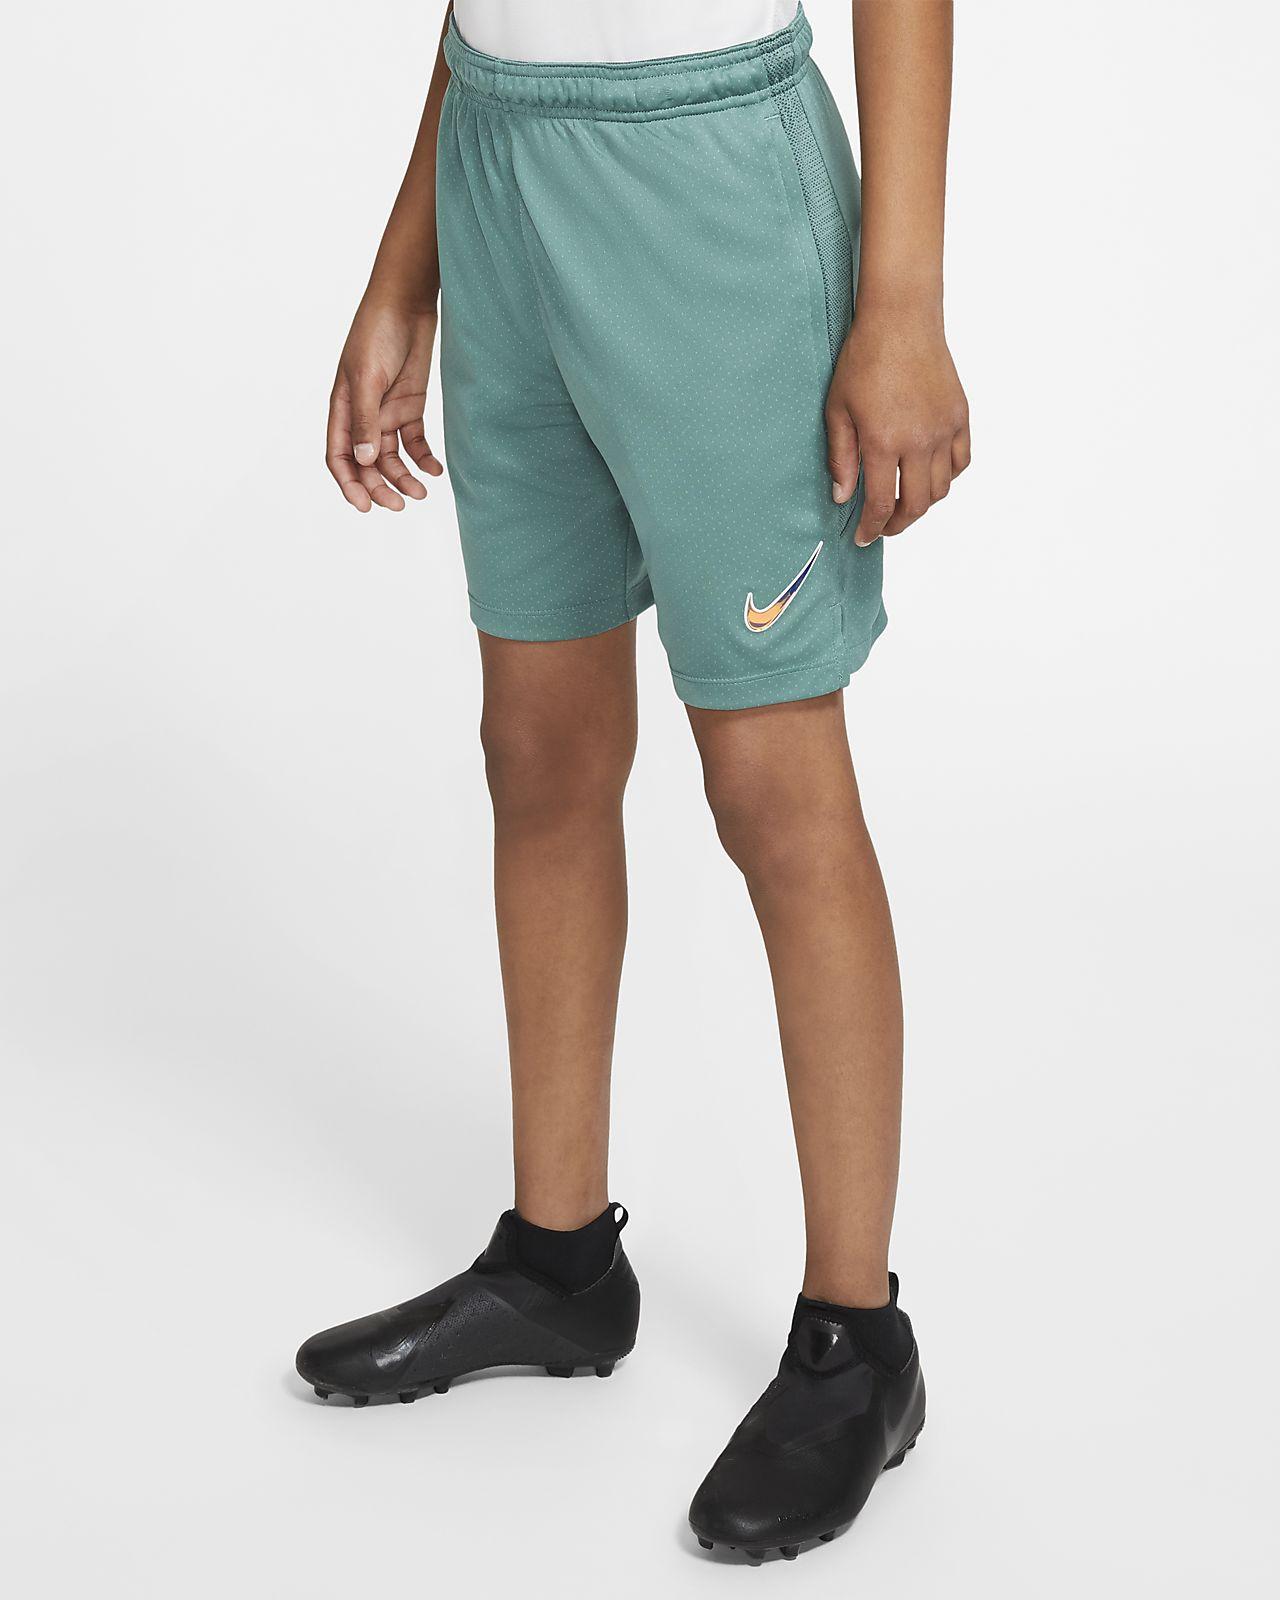 Shorts de fútbol para niños talla grande Nike Dri-FIT Strike